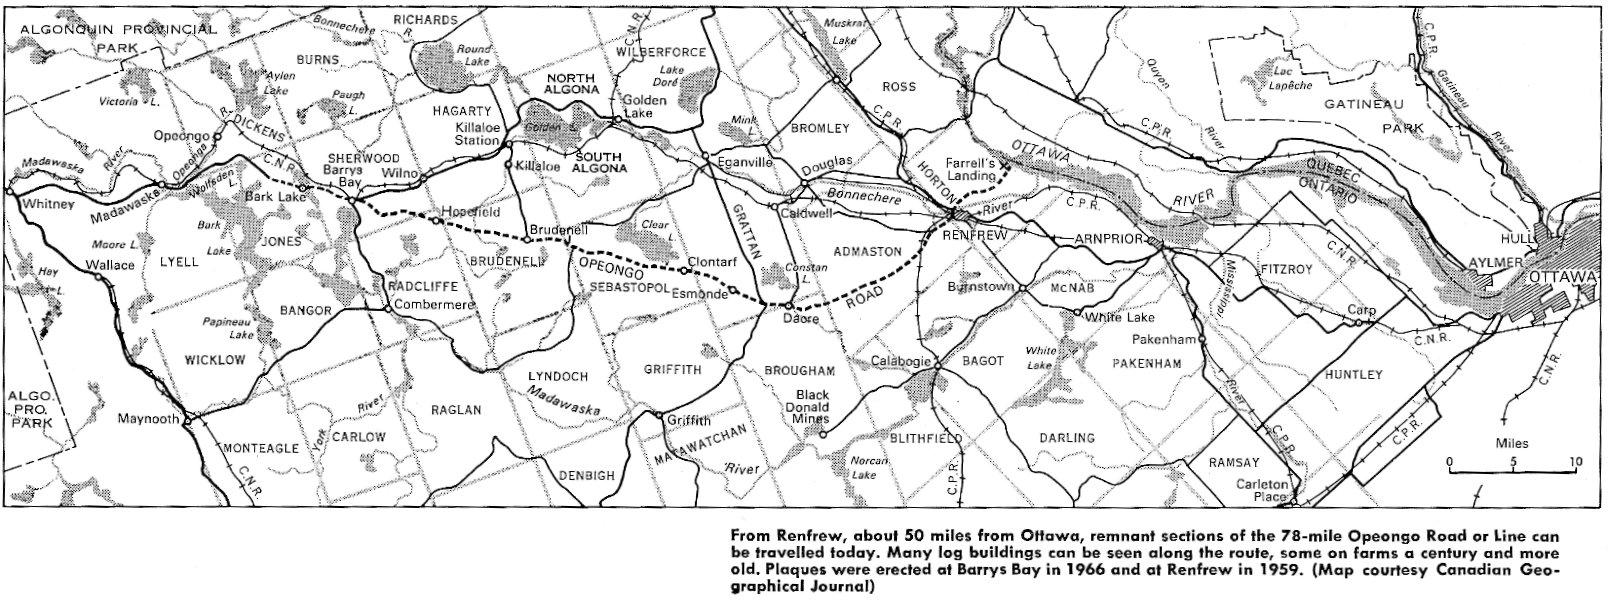 Opeongo Line, Opeongo Road, Renfrew County, Ontario, Canada